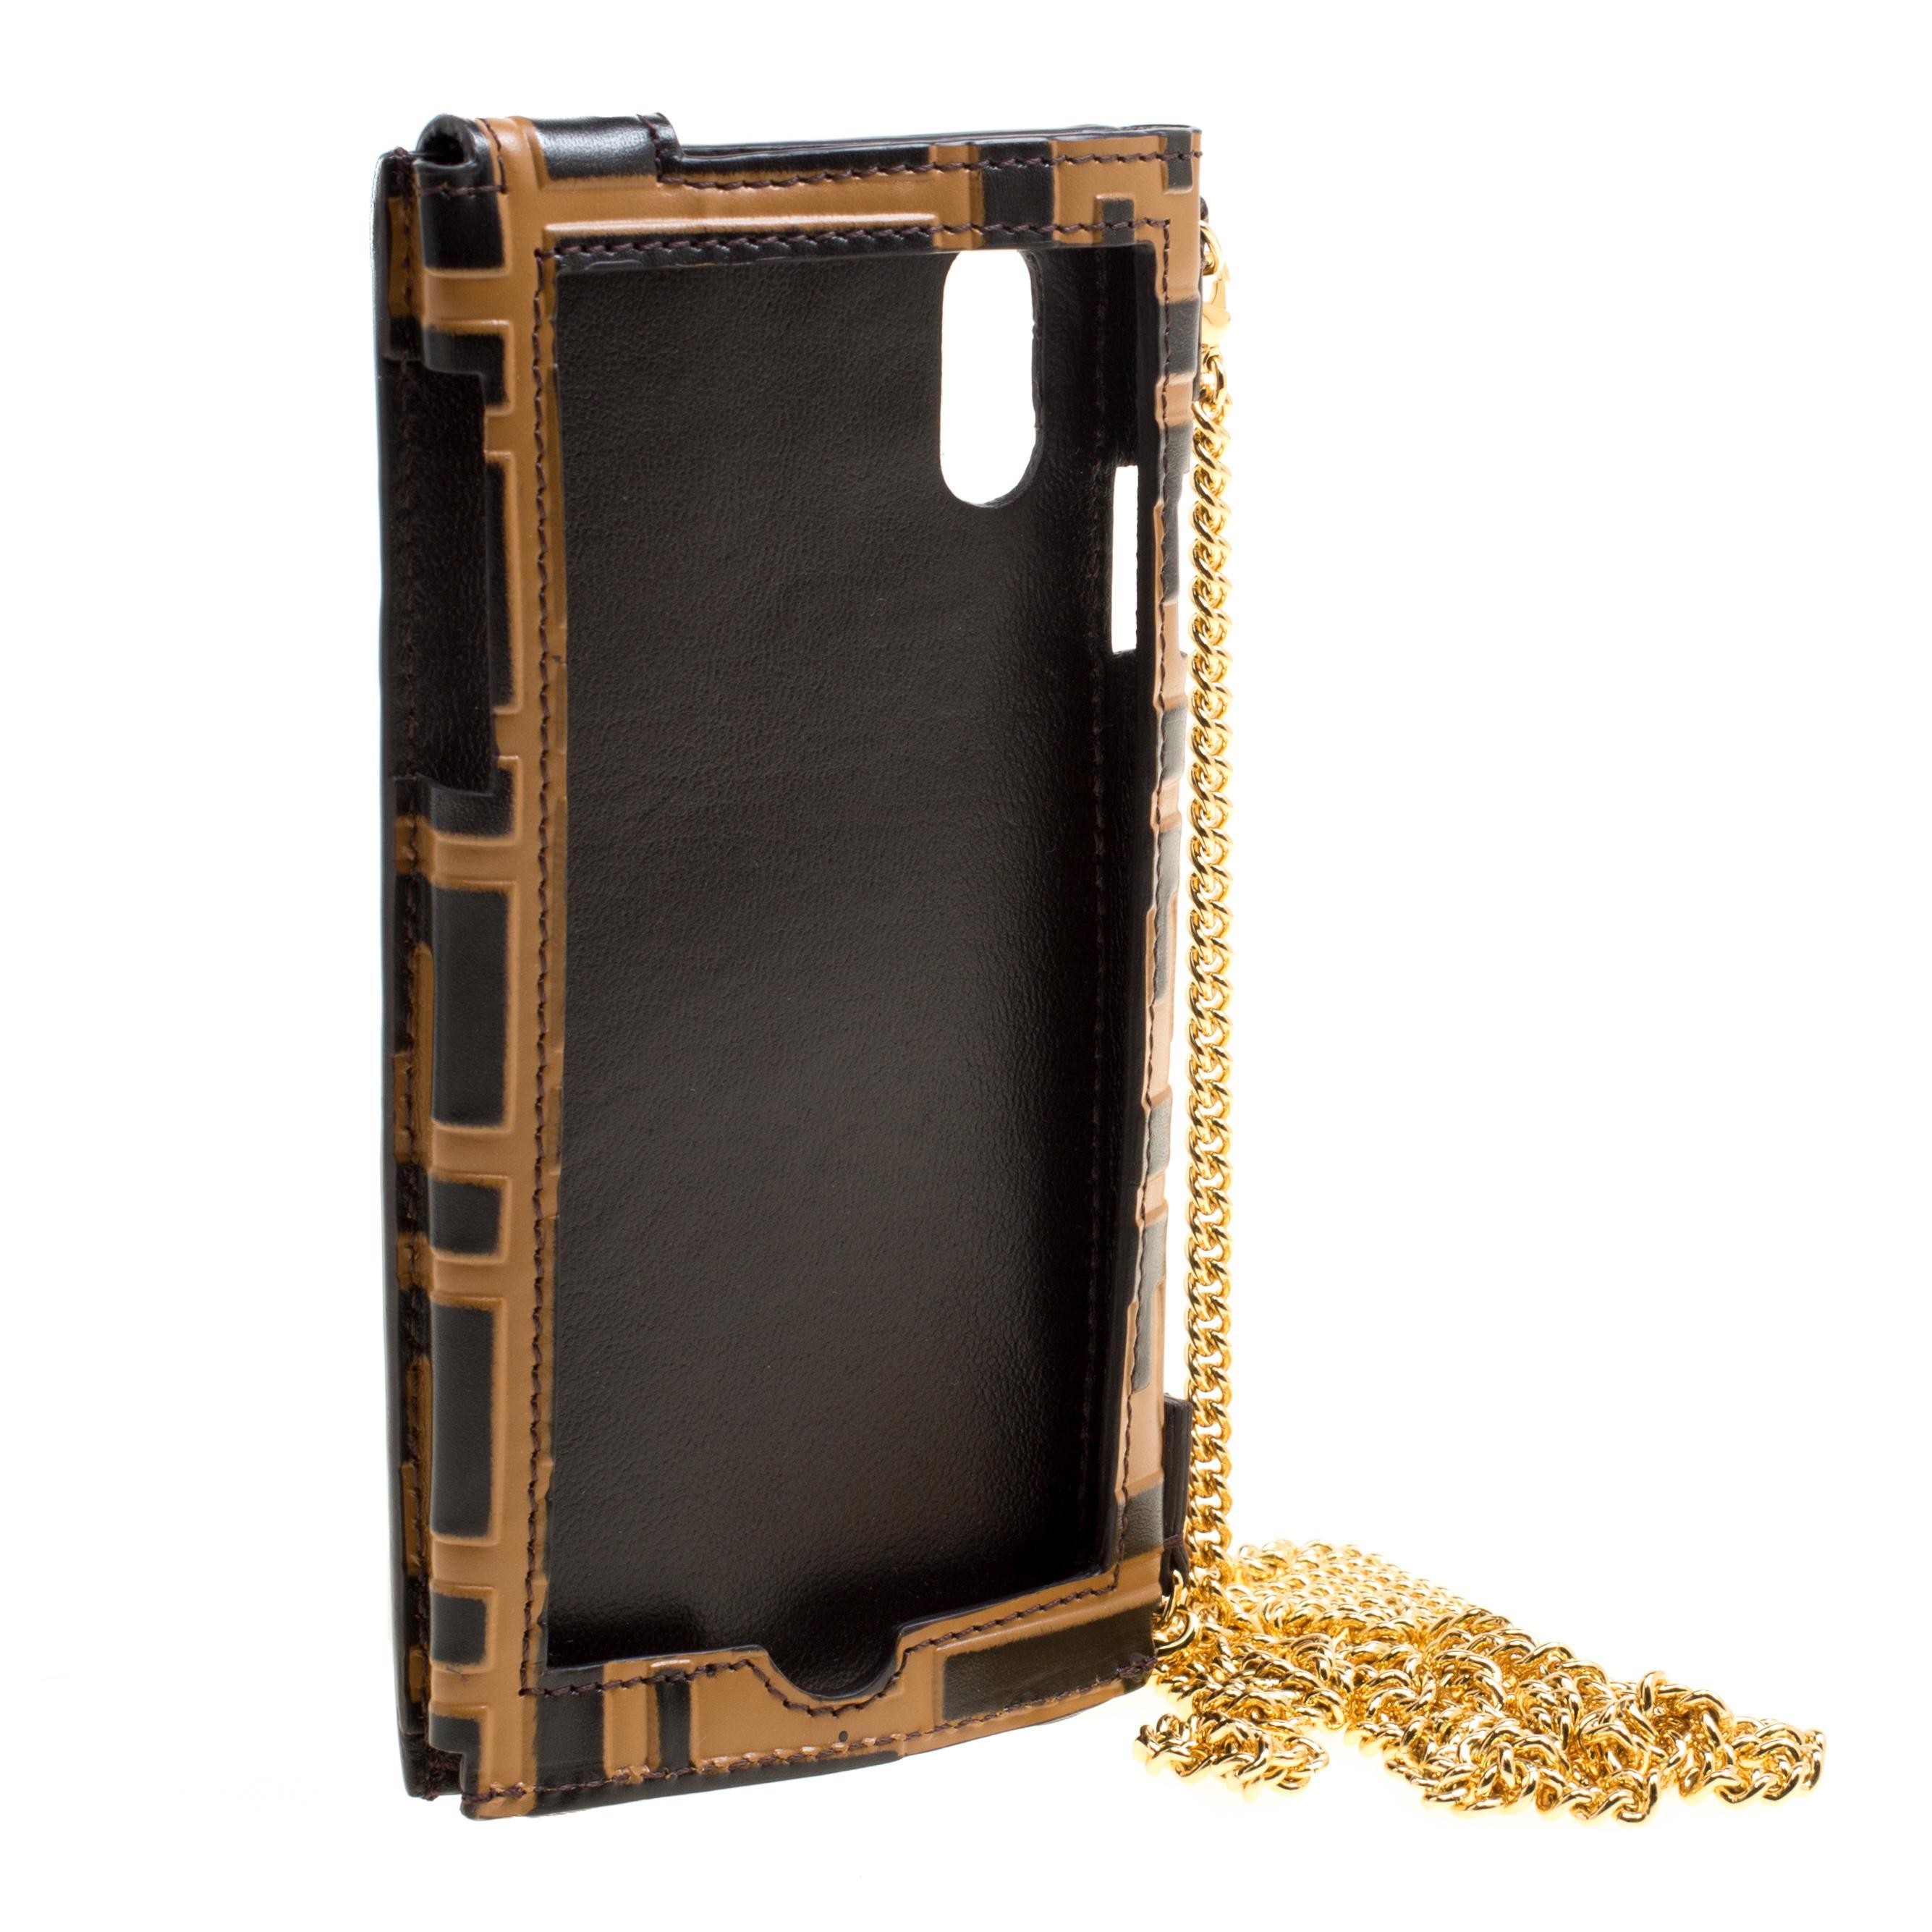 Dolce & Gabbana Pom Pom iPhone 7 cover  Browns